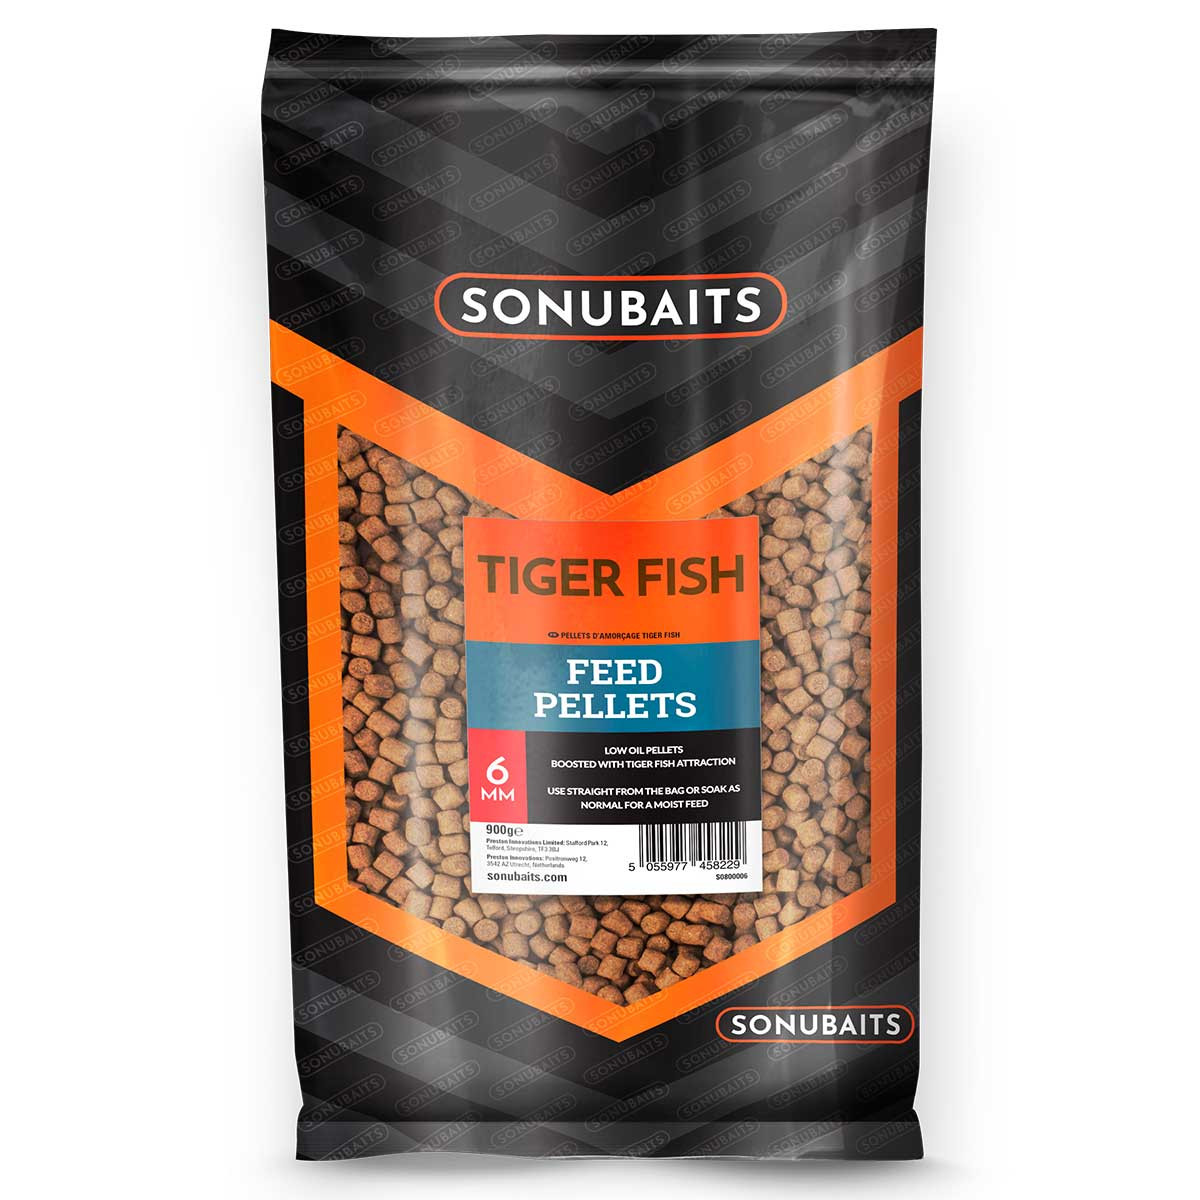 Sonubaits Tiger Fish Feed Pellets 6mm